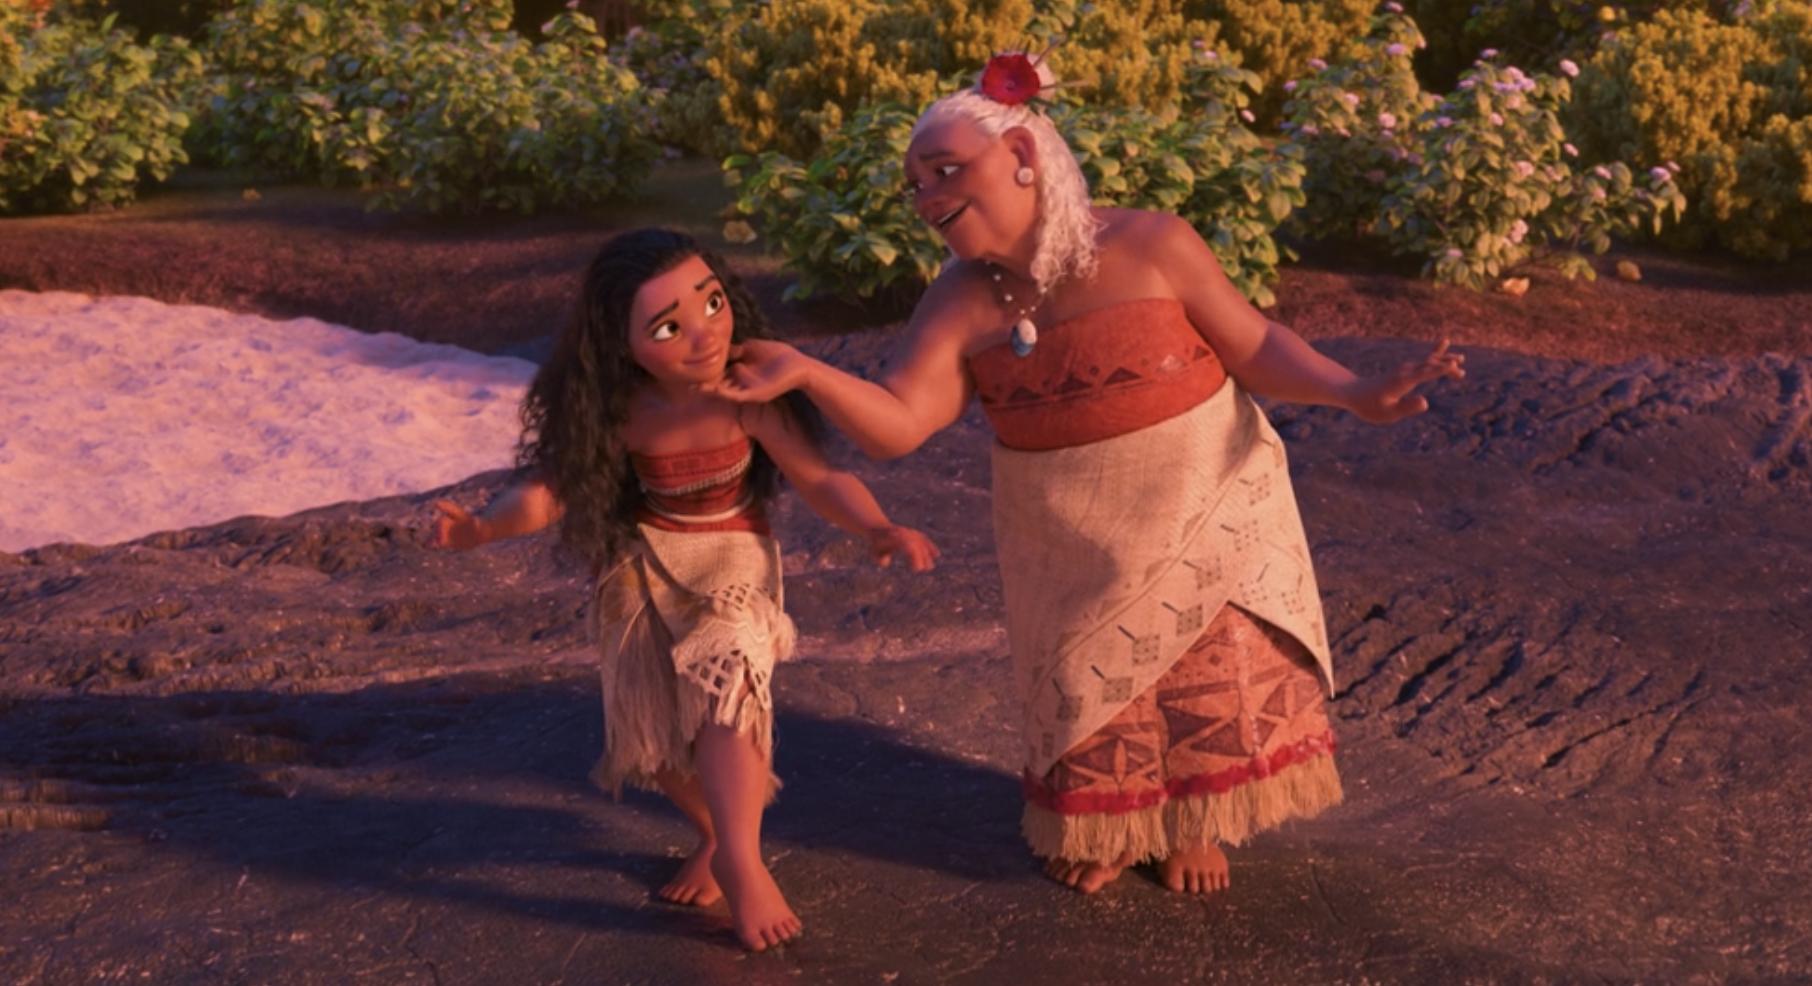 Moana dancing with her grandma, who is touching Moana's chin